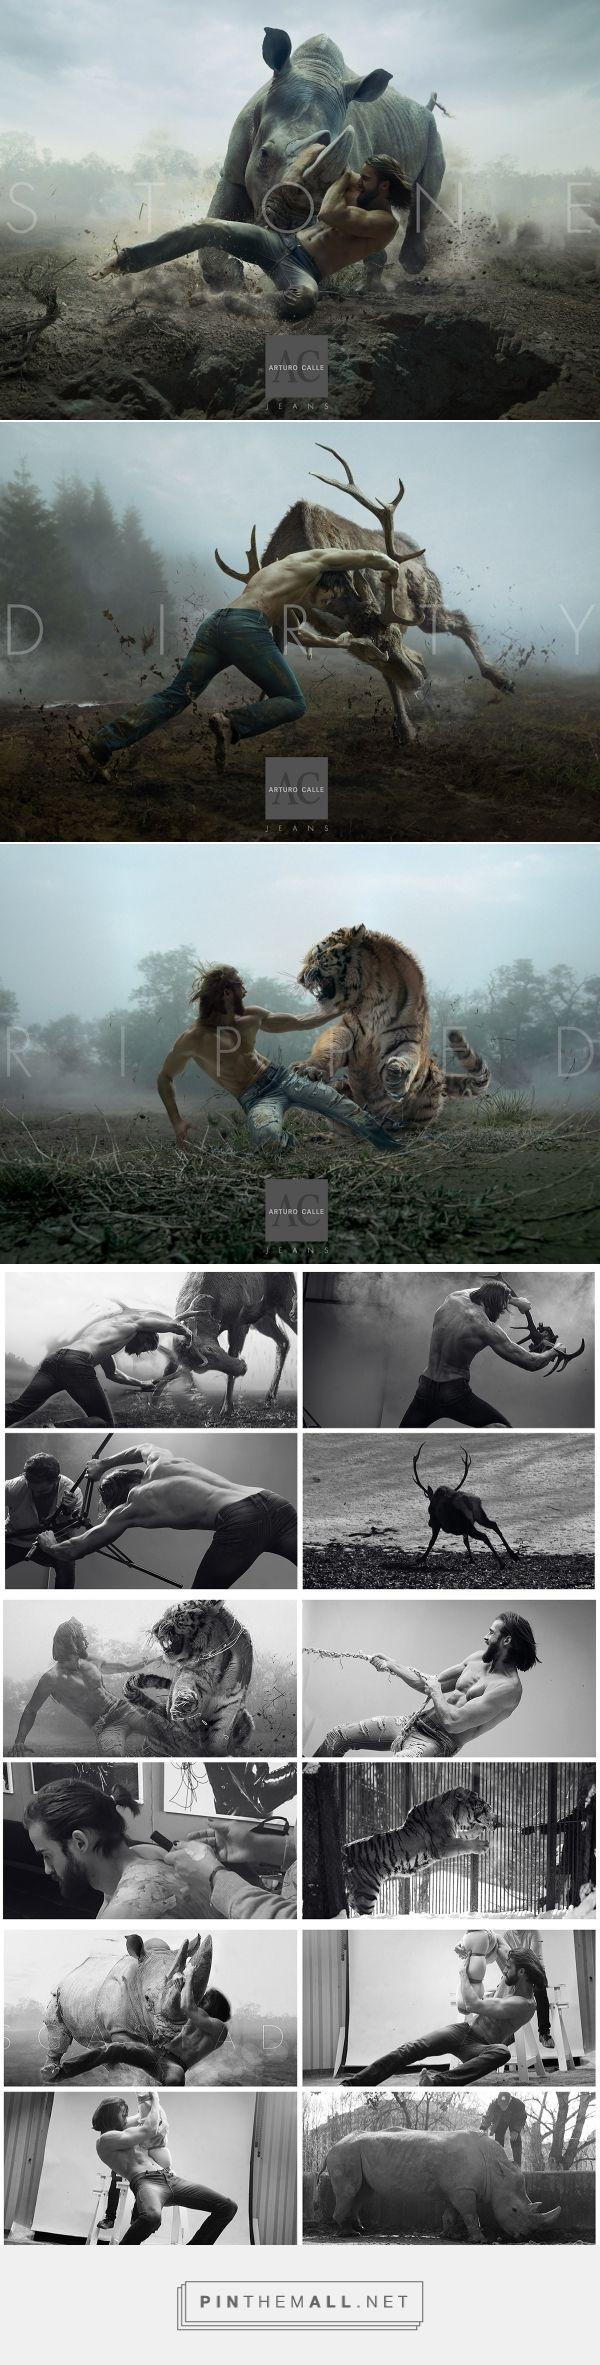 PRINT - Wild Process - Arturo Calle Jeans on Behance - created via https://pinthemall.net